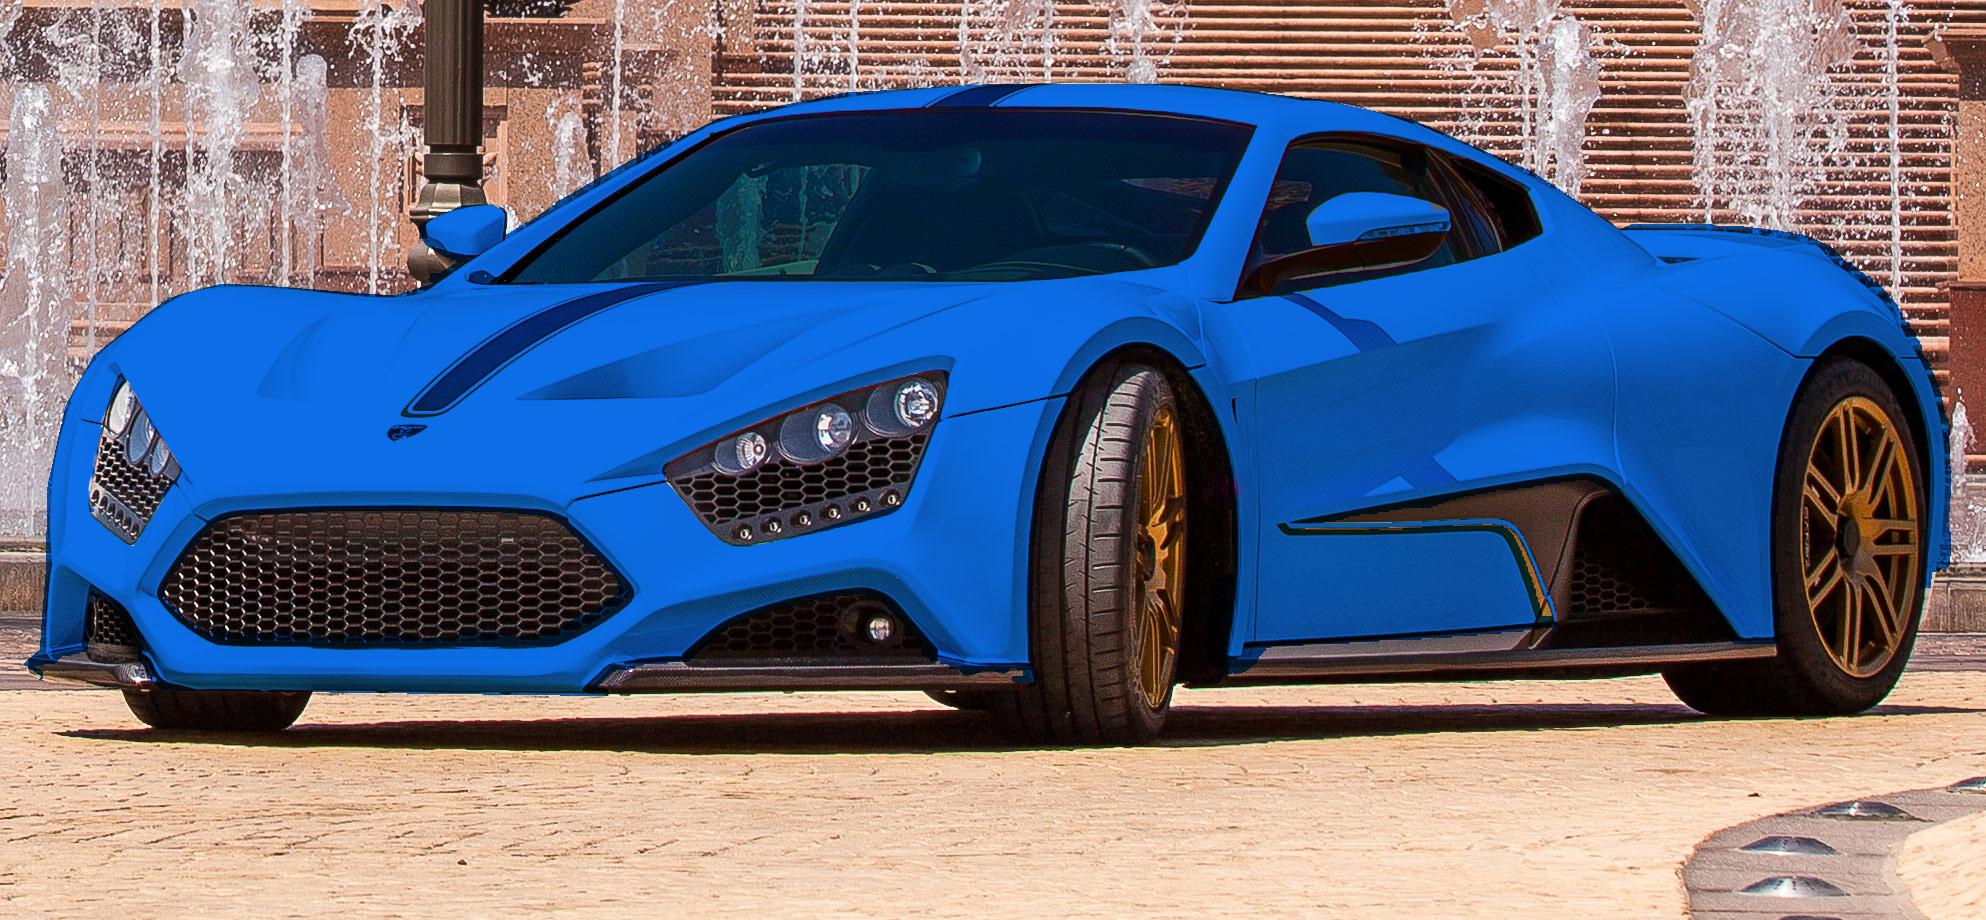 Zenvo St1 Blue 2014 Zenvo St1 Colorizer 7